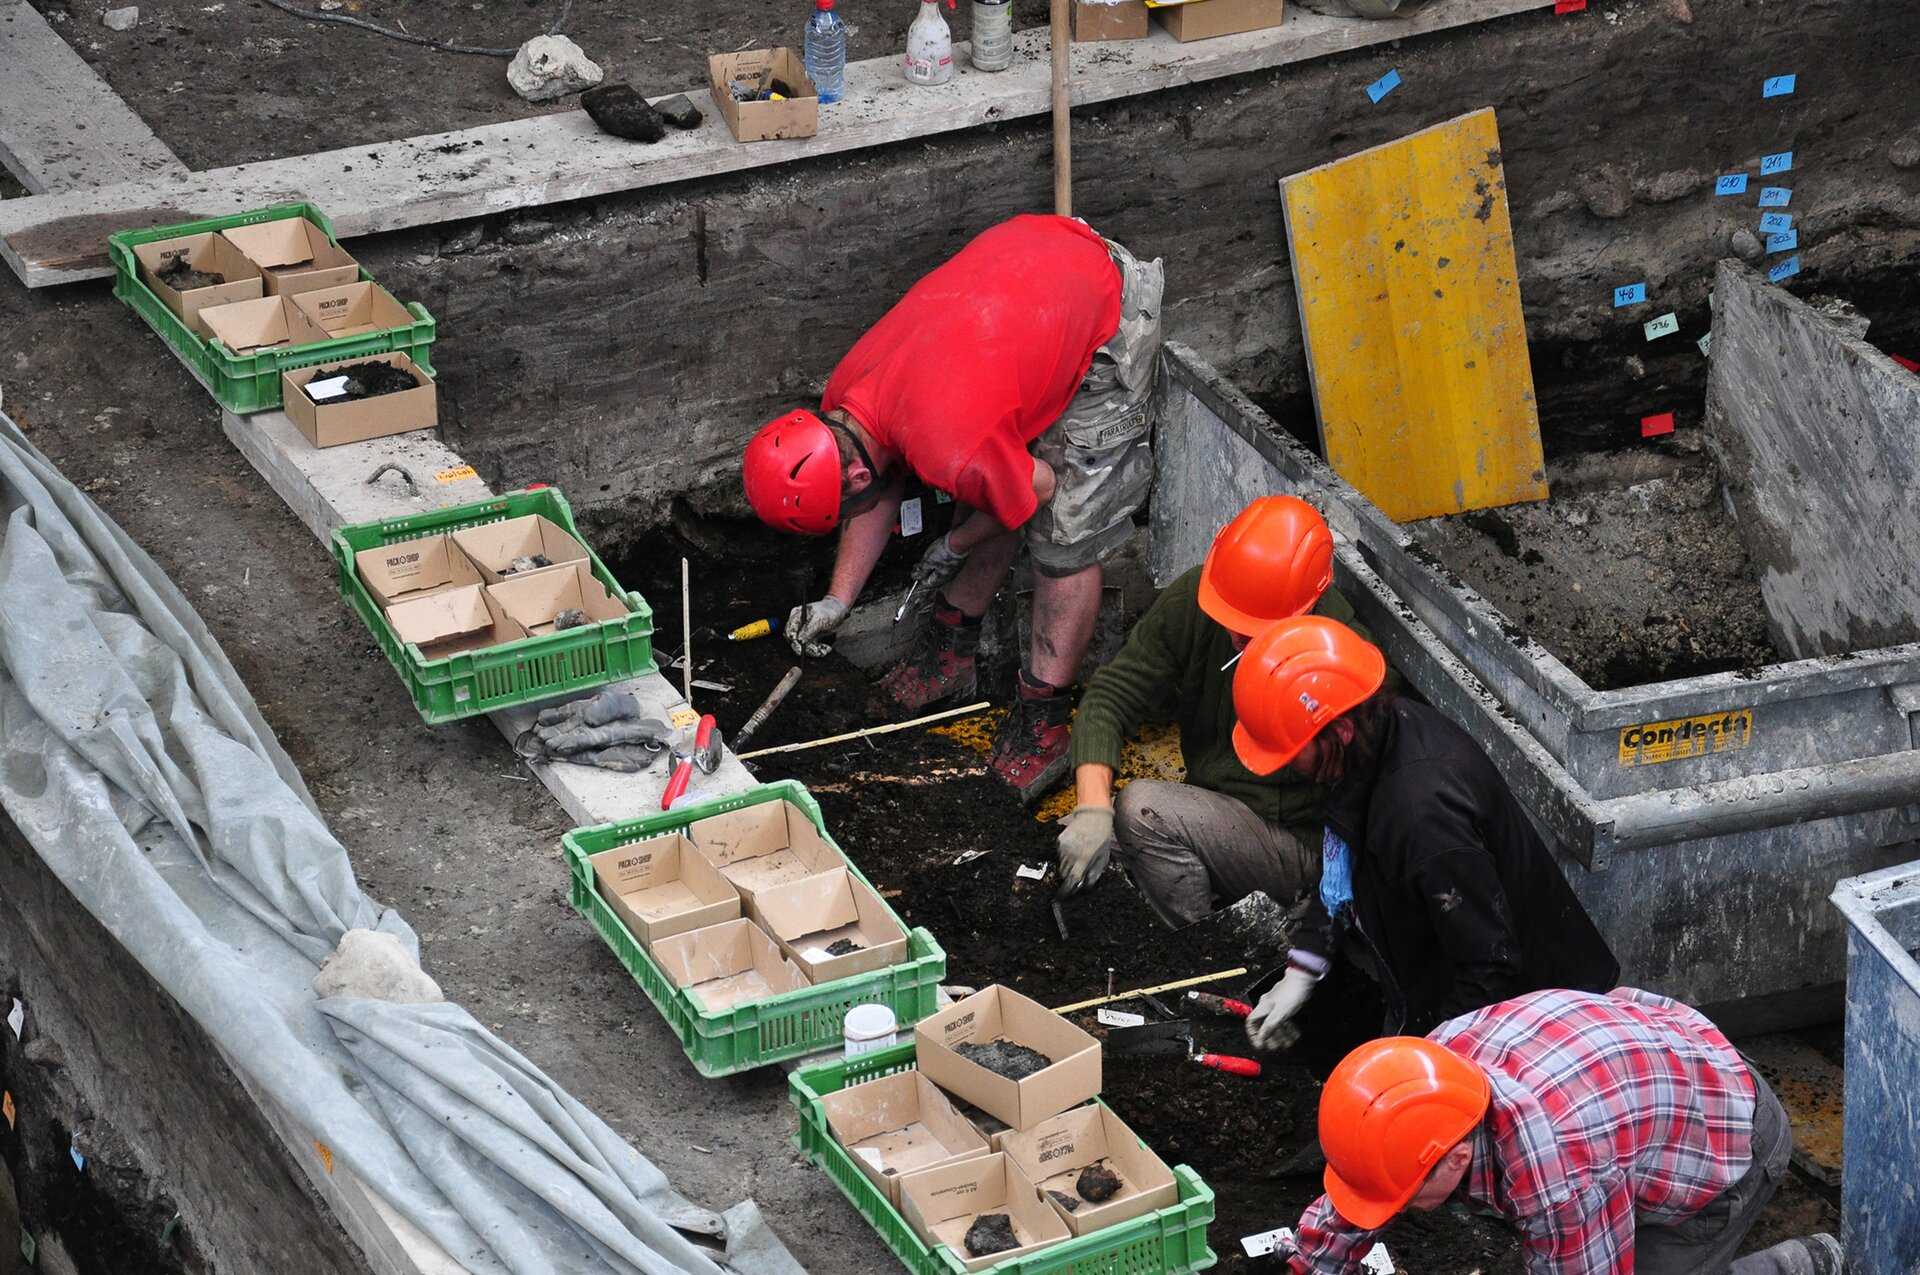 Archeolodzy przy pracy Archeolodzy przy pracy Źródło: Roland zh, Wikimedia Commons, licencja: CC BY-SA 3.0.